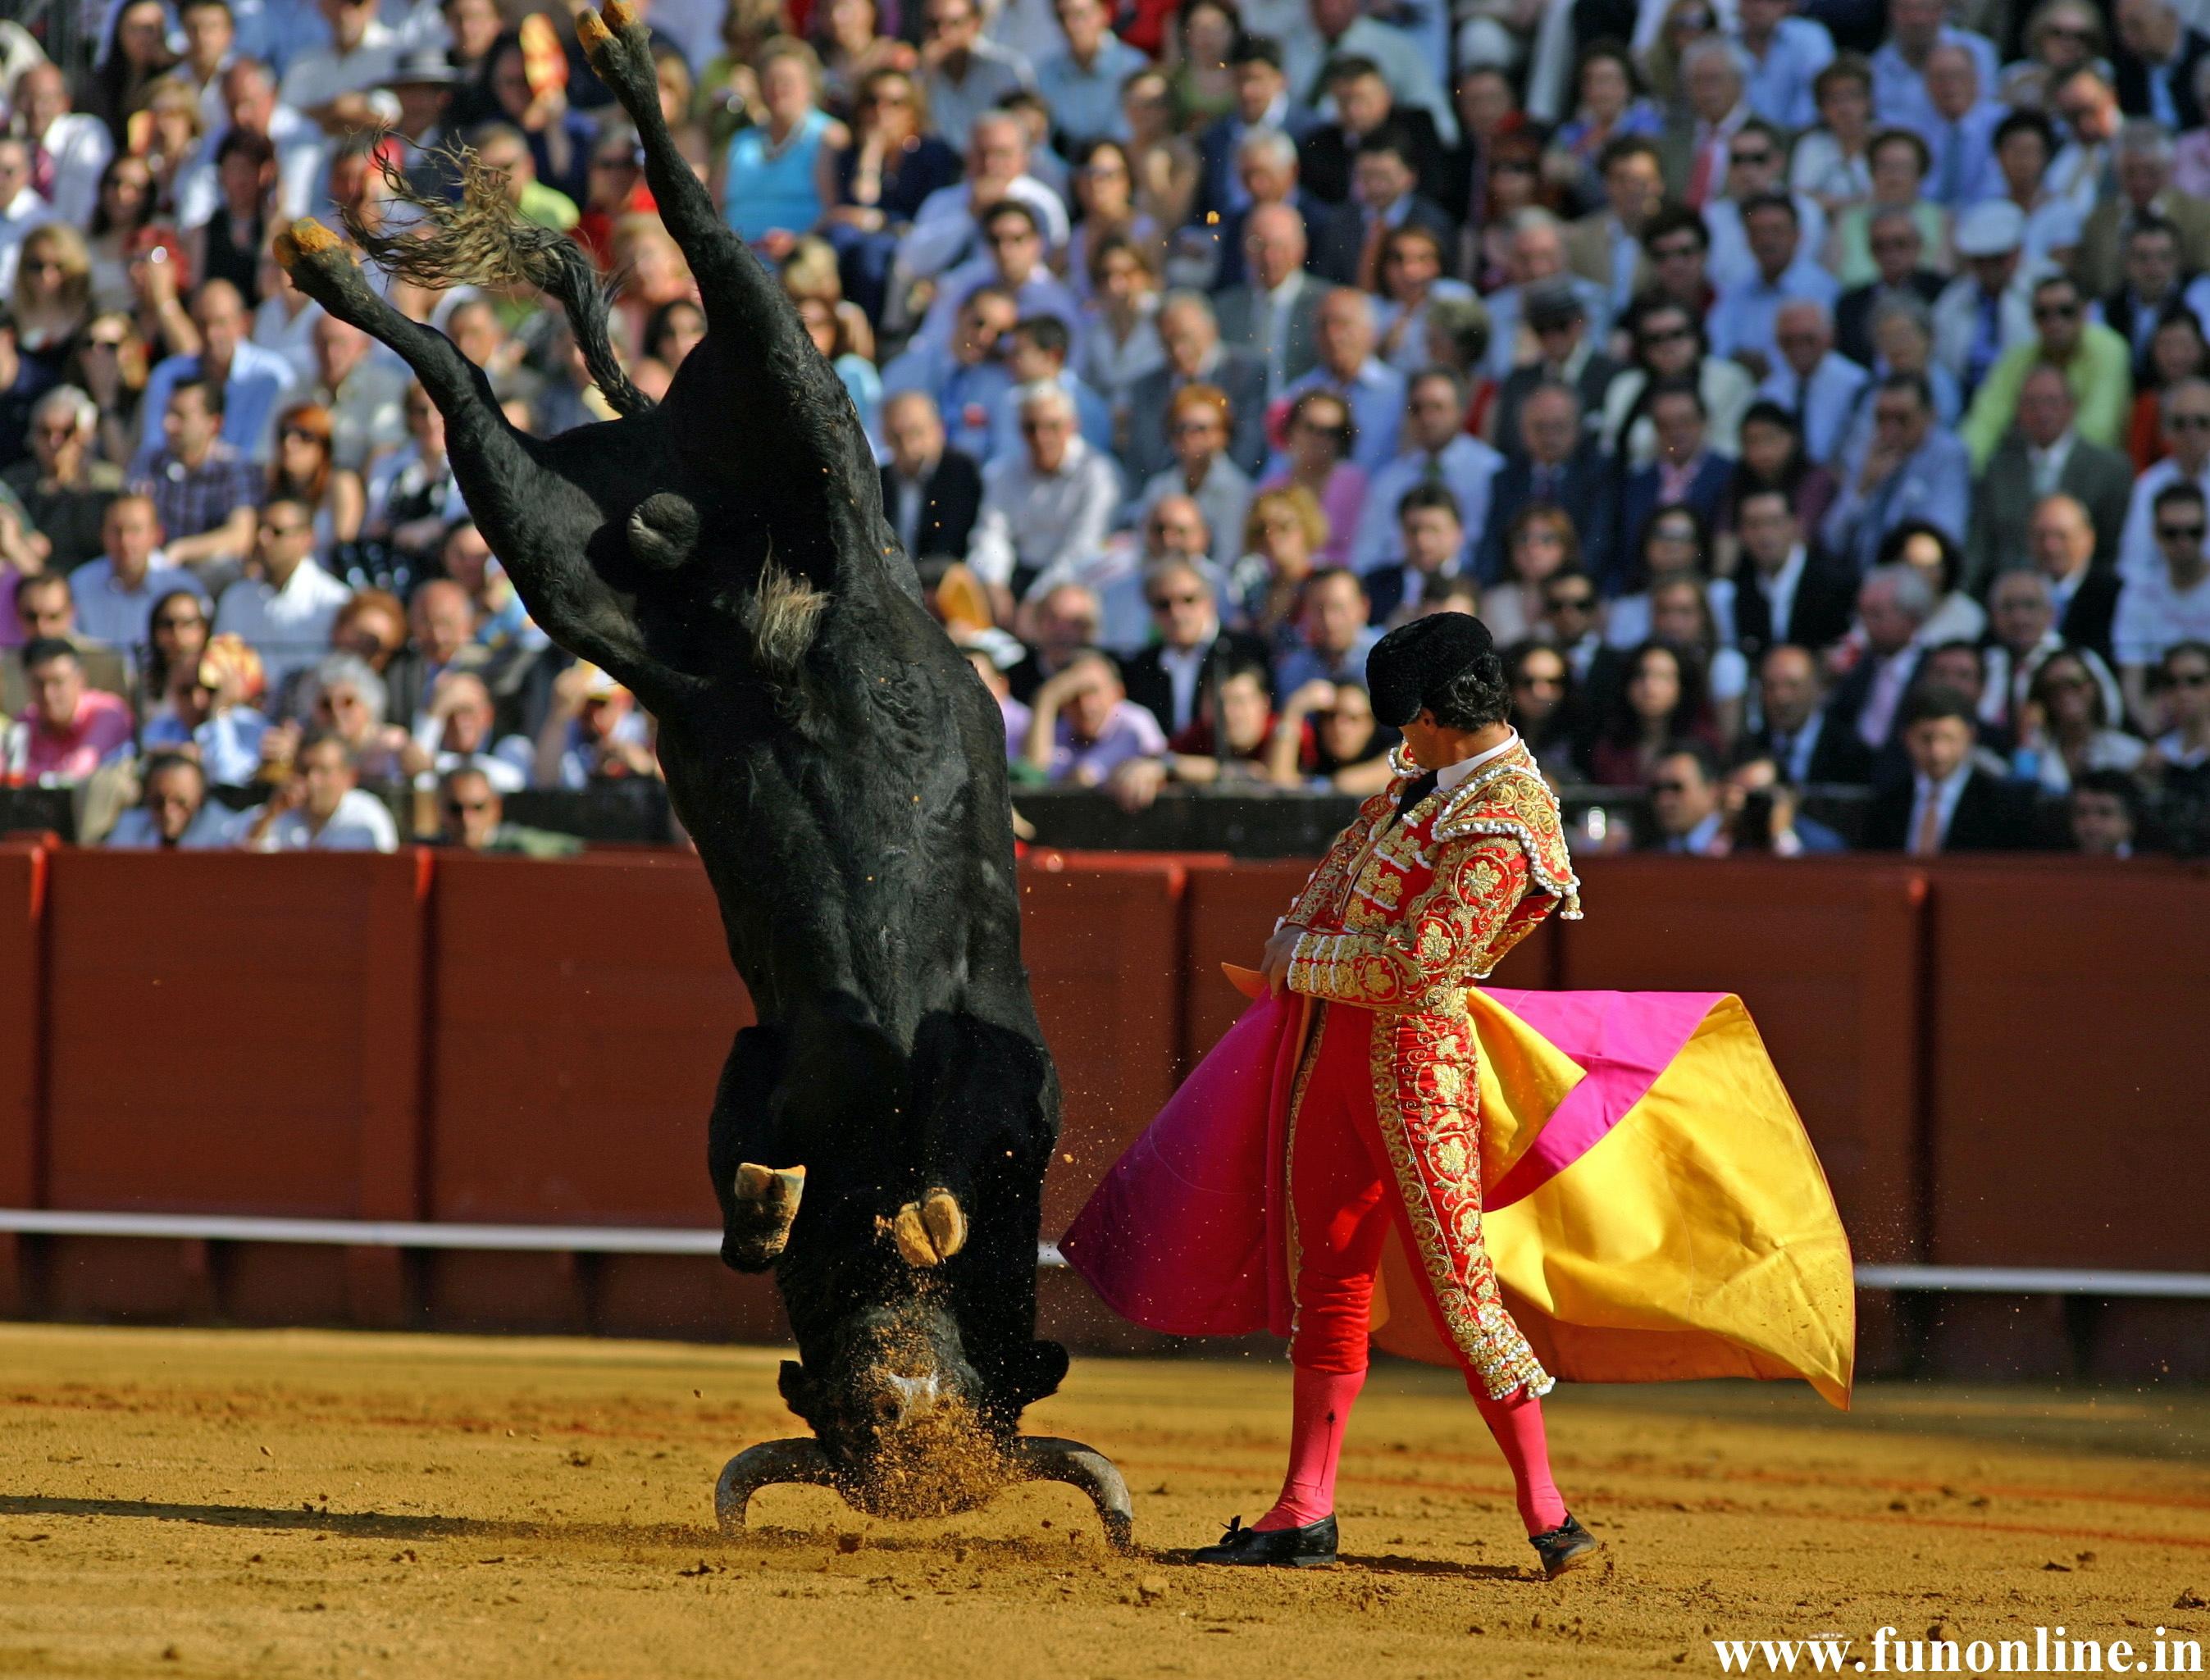 bull fighting 1920x1080 hd - photo #21